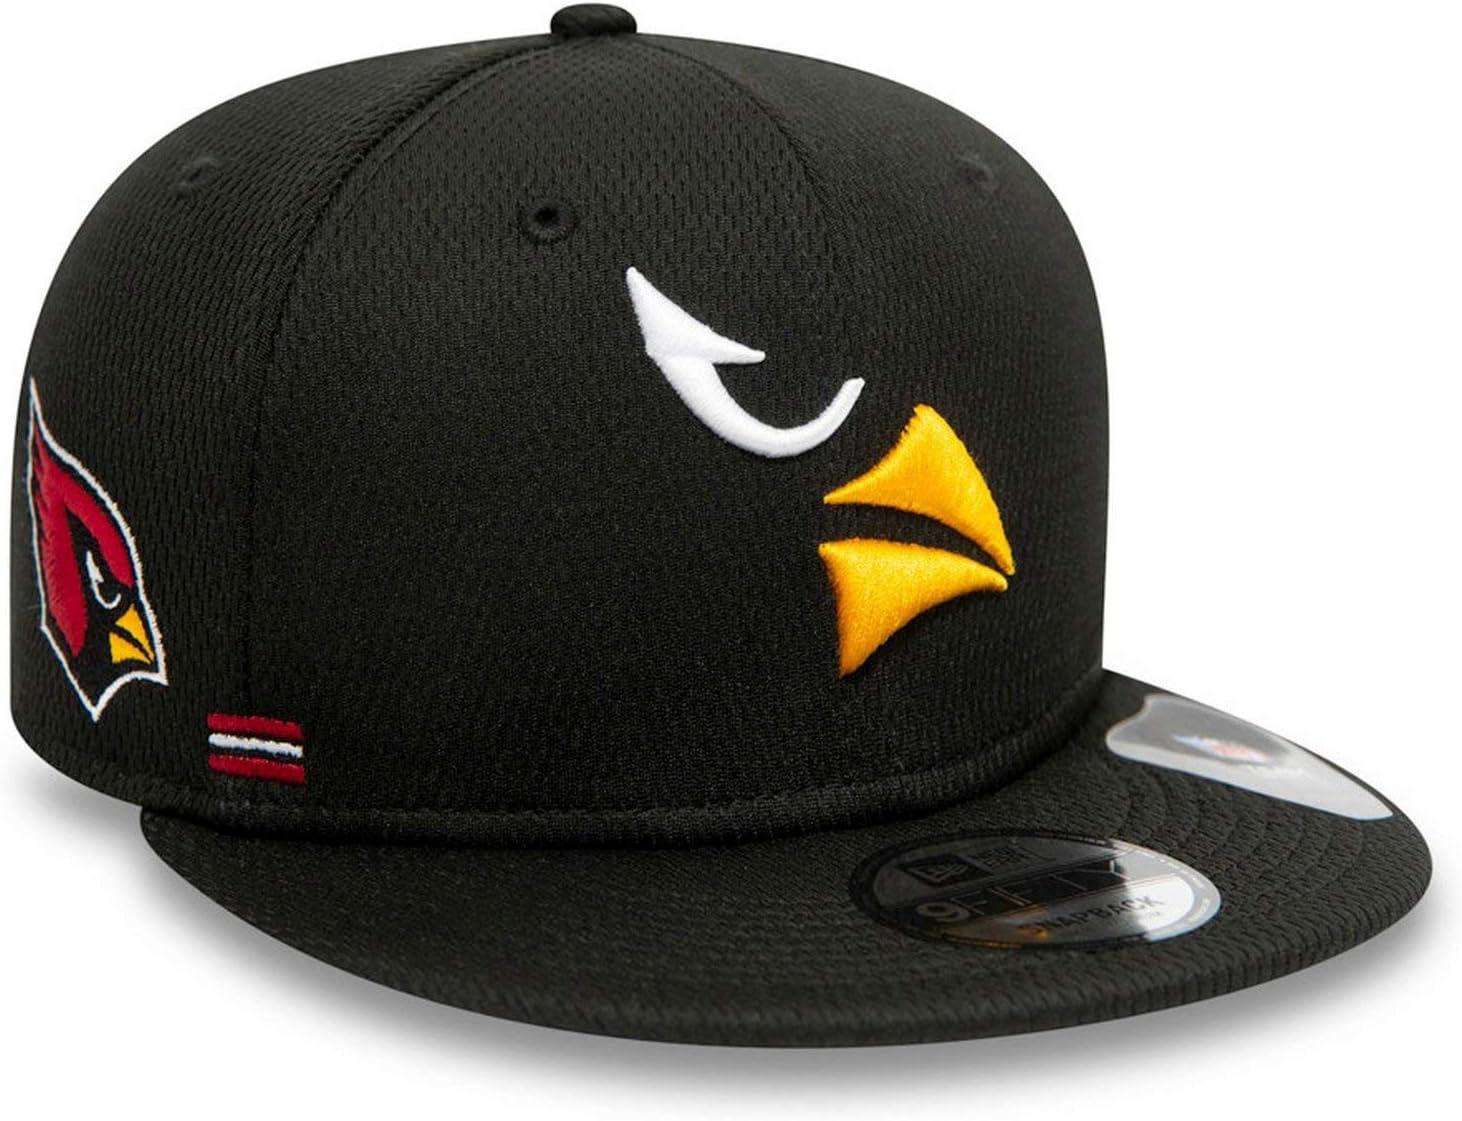 New Era 9FIFTY Snapback Cap HOMETOWN Arizona Cardinals